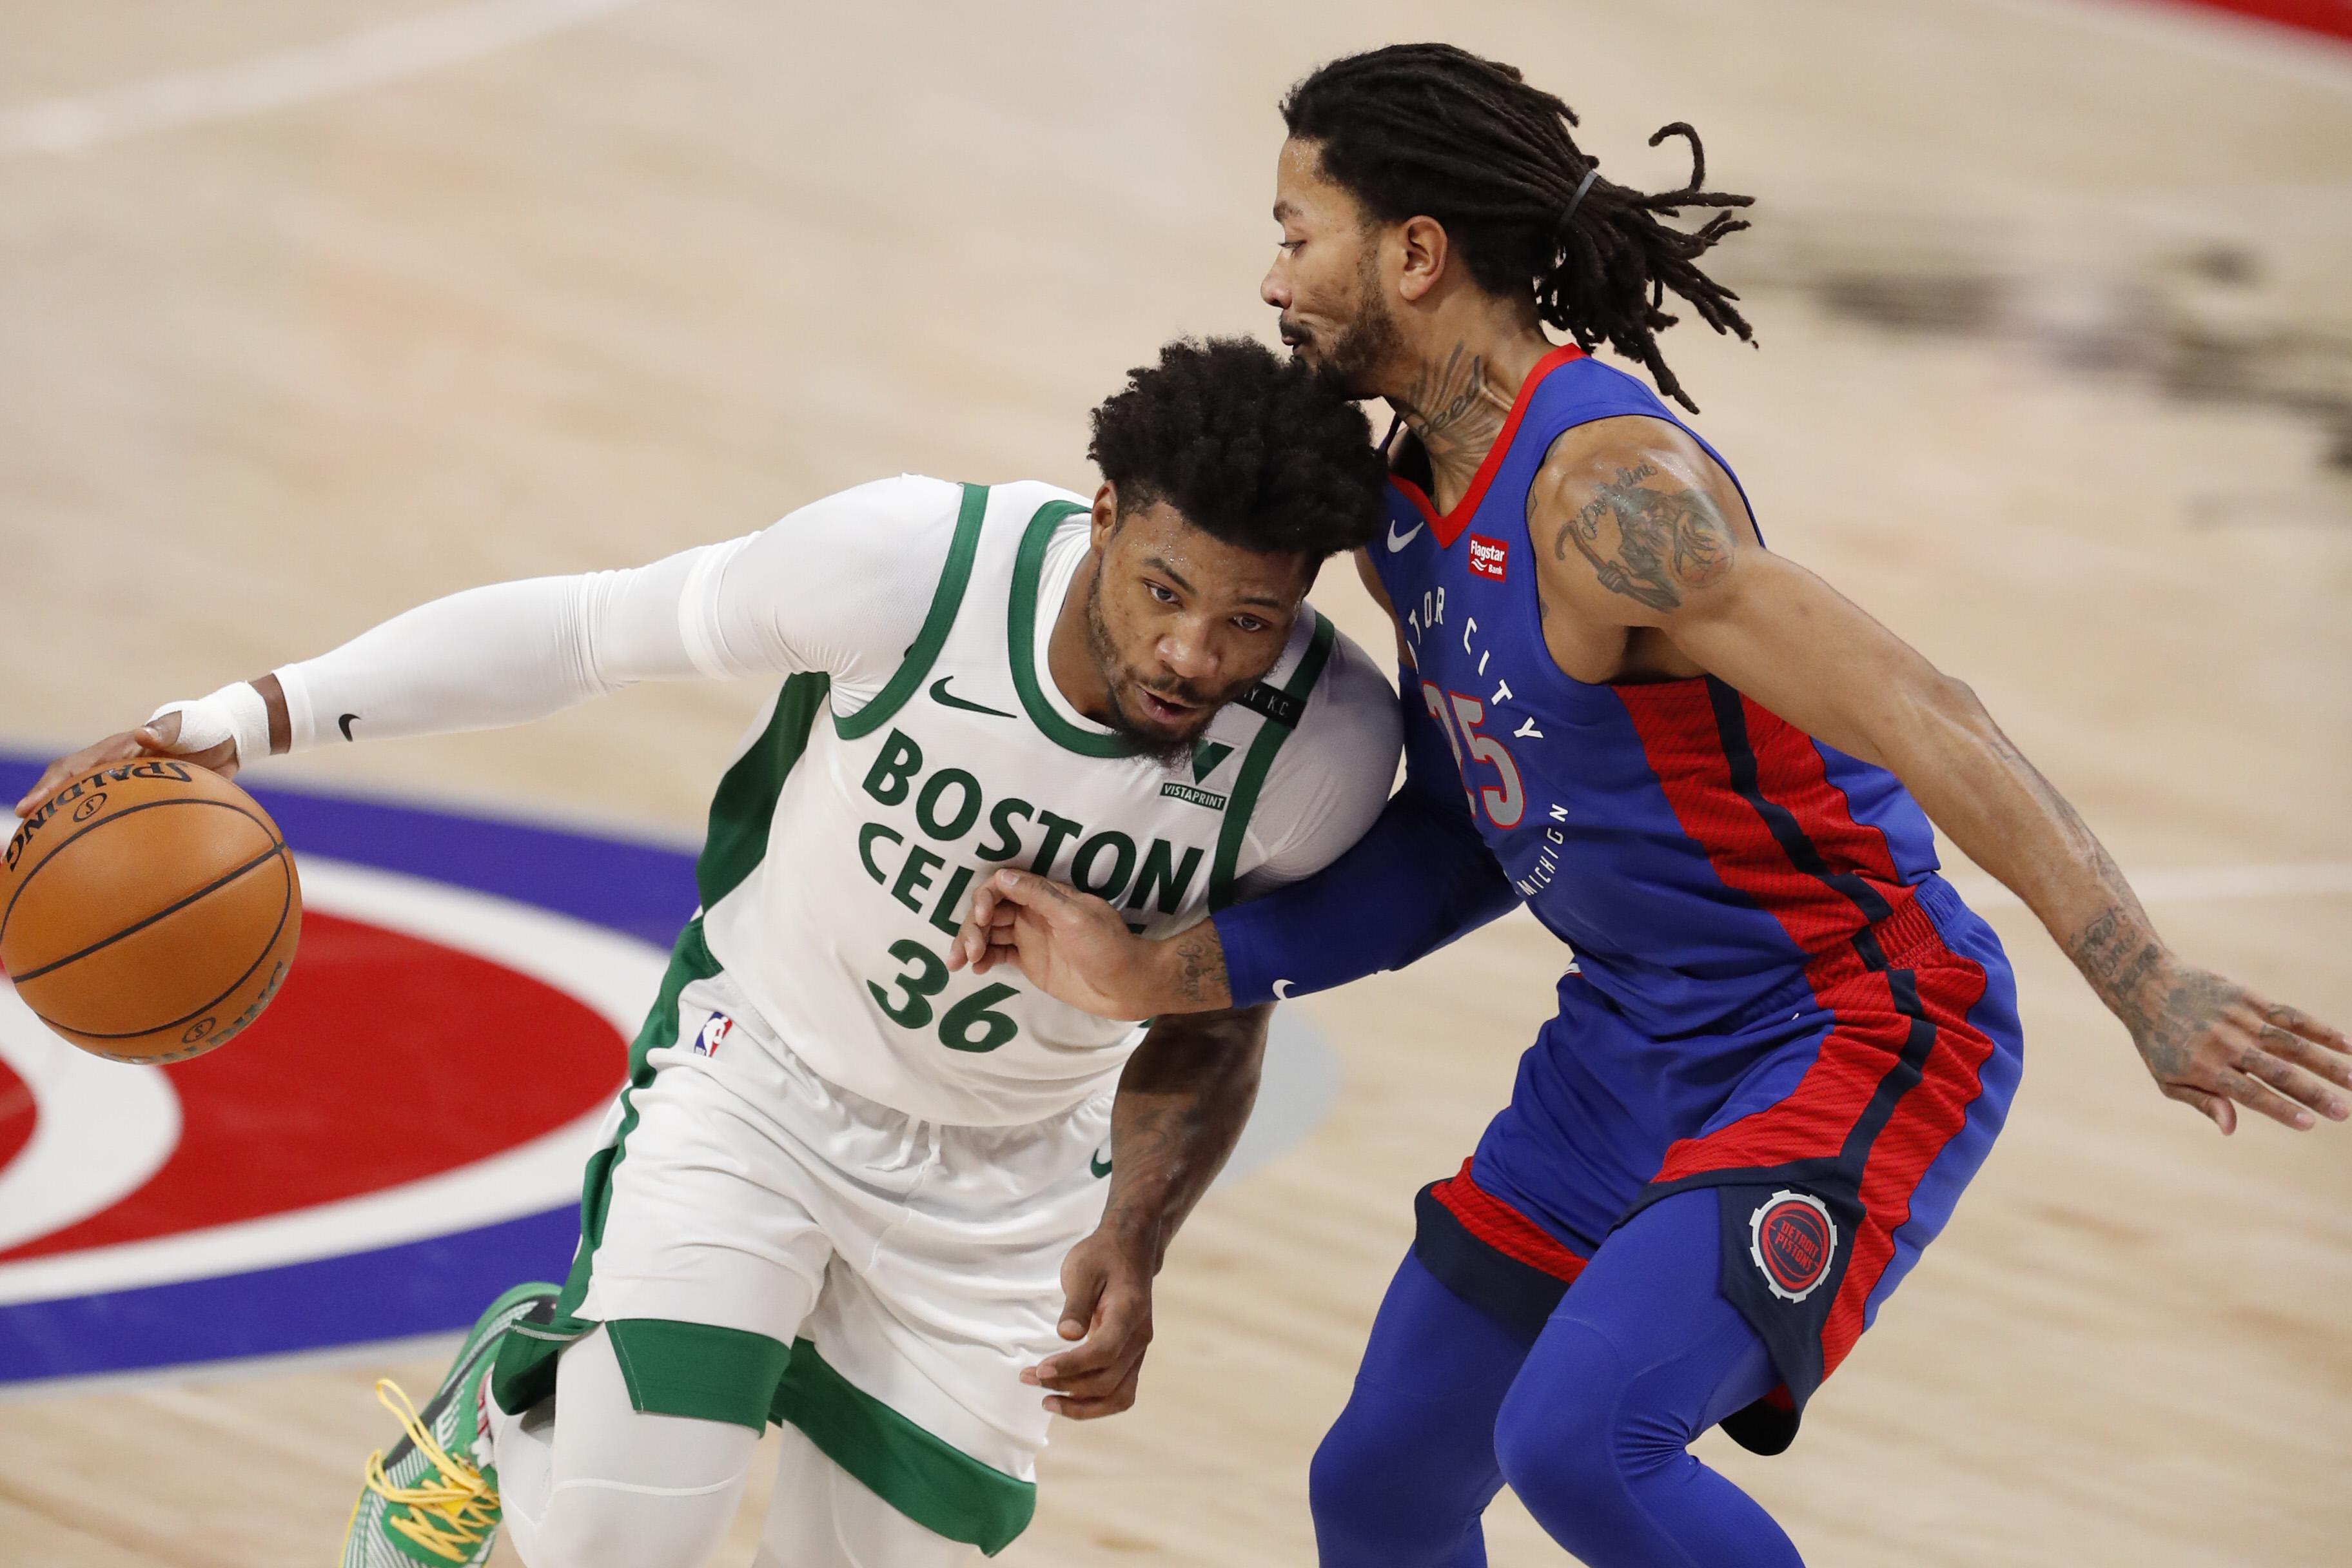 Marcus Smart's steady hand guides Boston Celtics as Jayson Tatum, Jaylen Brown carry scoring load